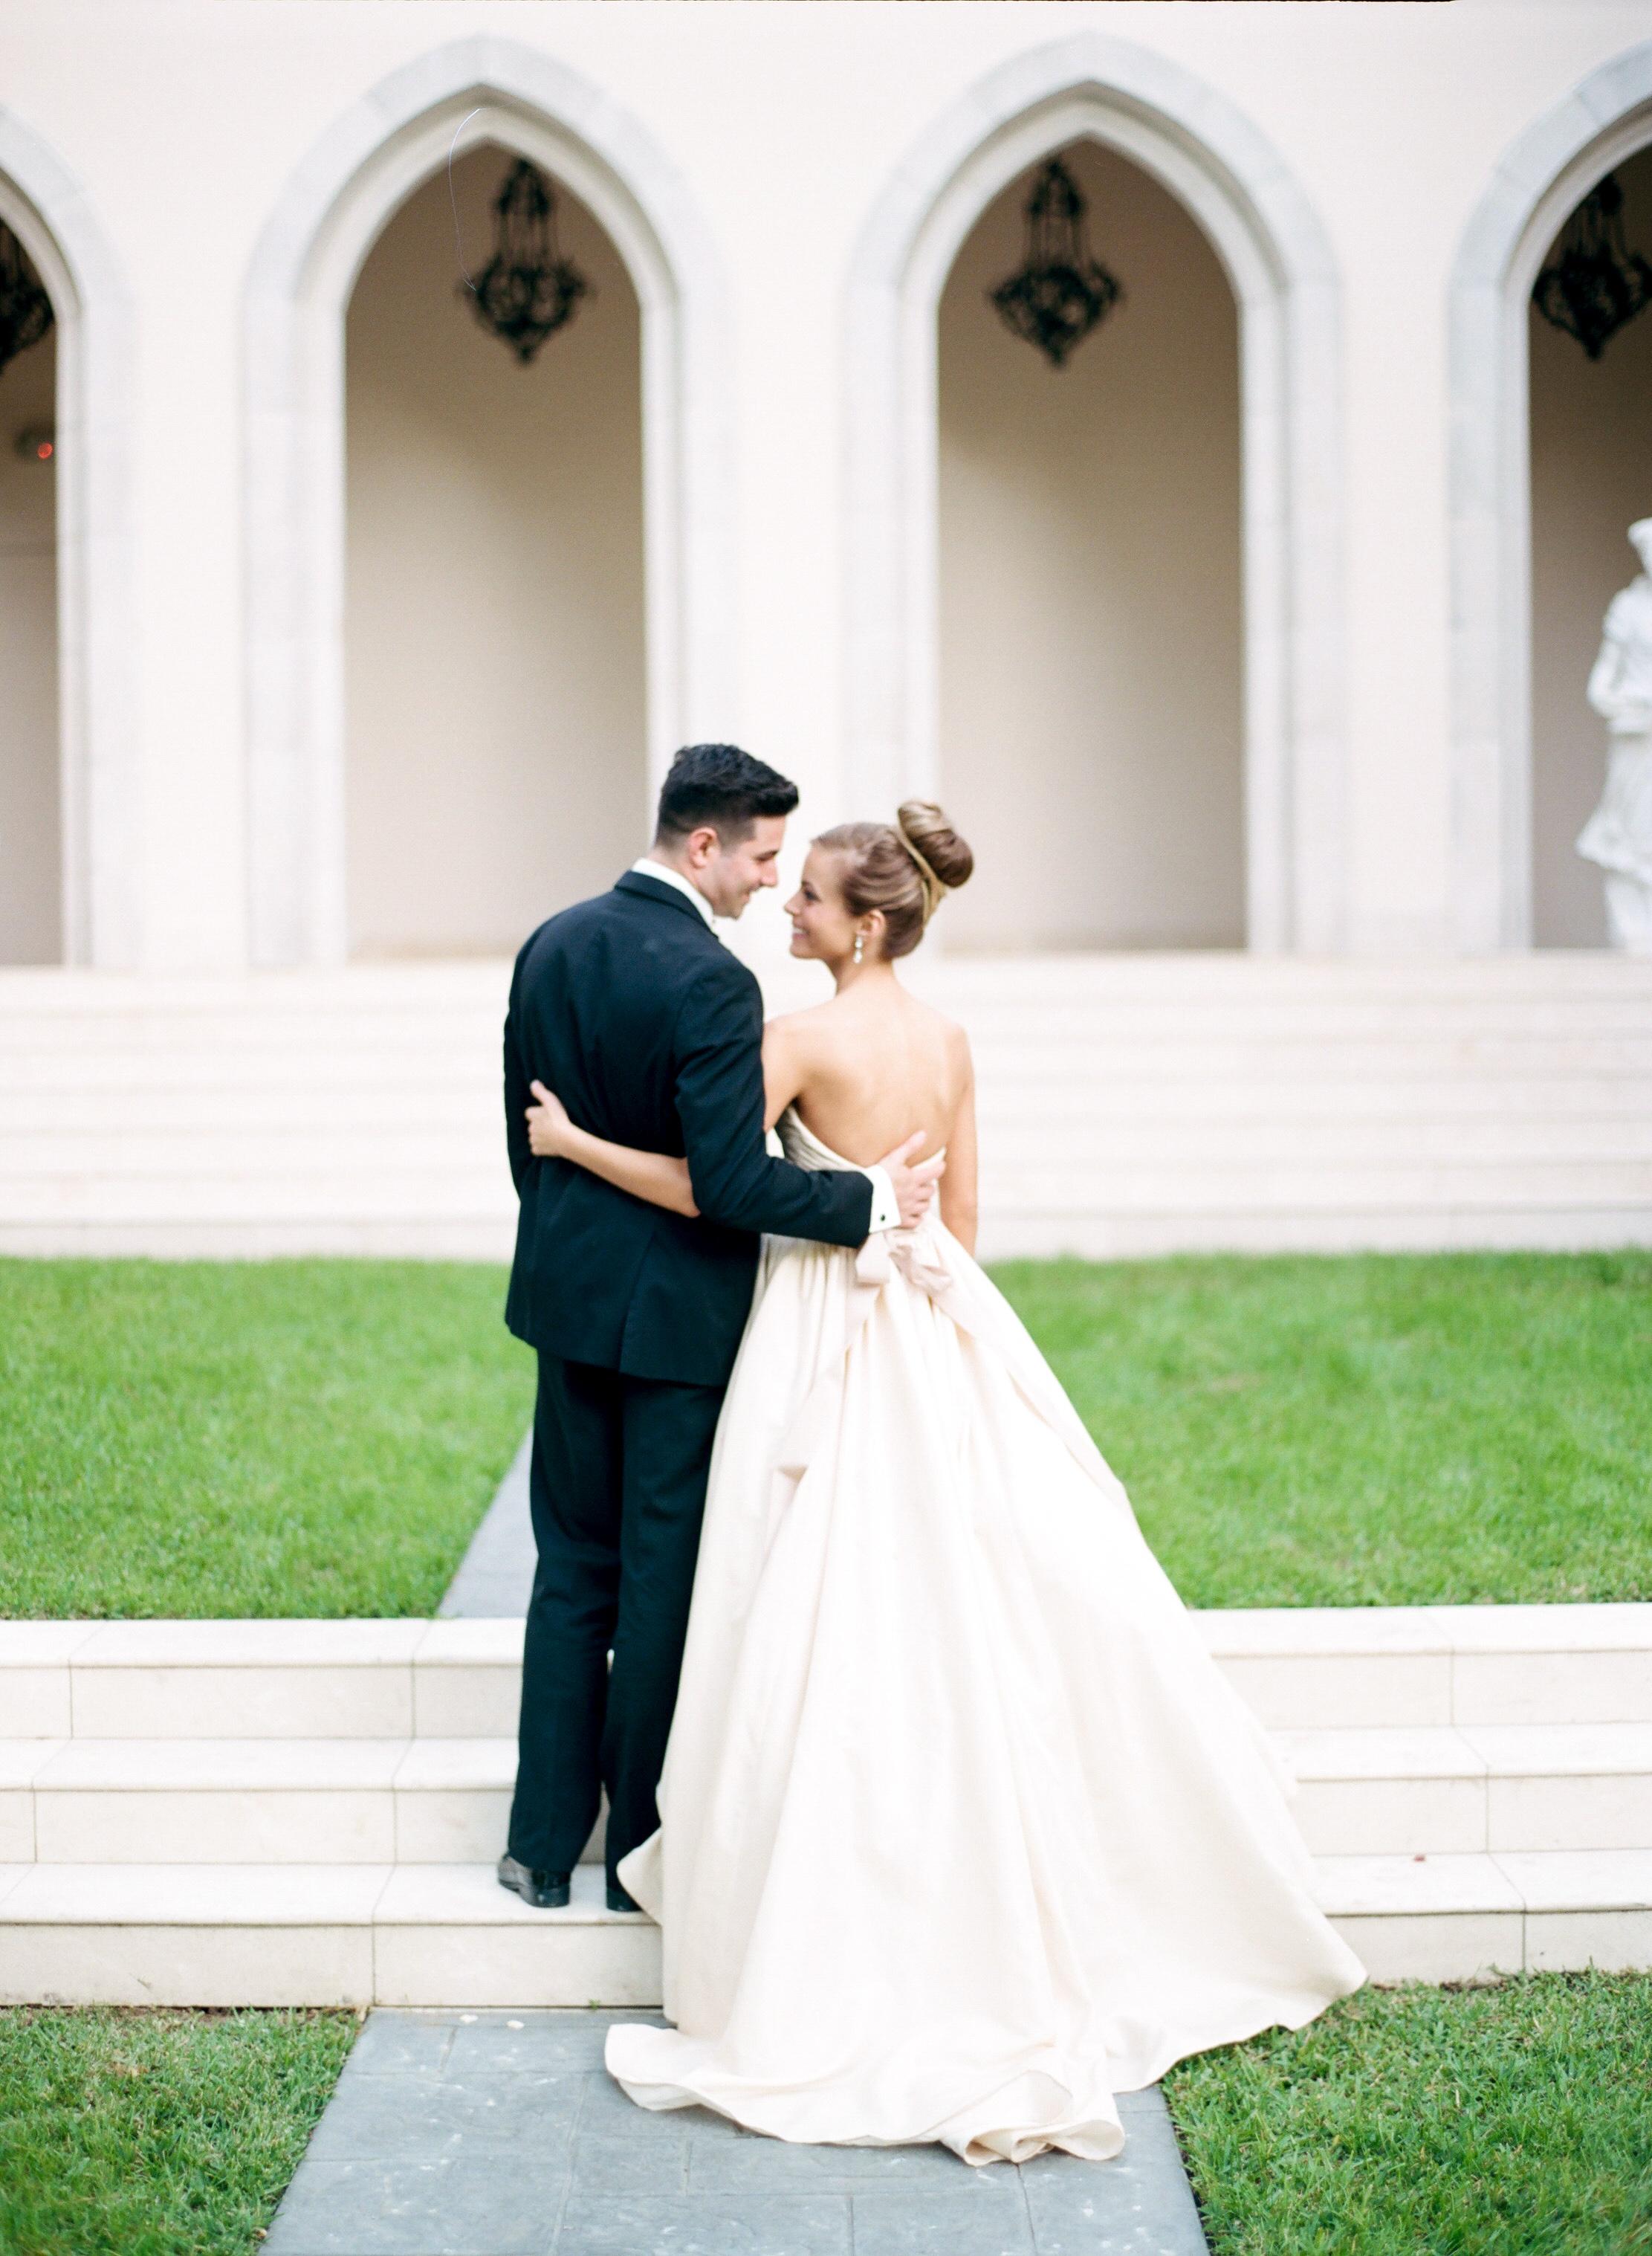 Dana-Fernandez-Photography-Houston-Wedding-Photographer-Style-Me-Pretty-Film-Texas-Destination-Photographer-40.jpg